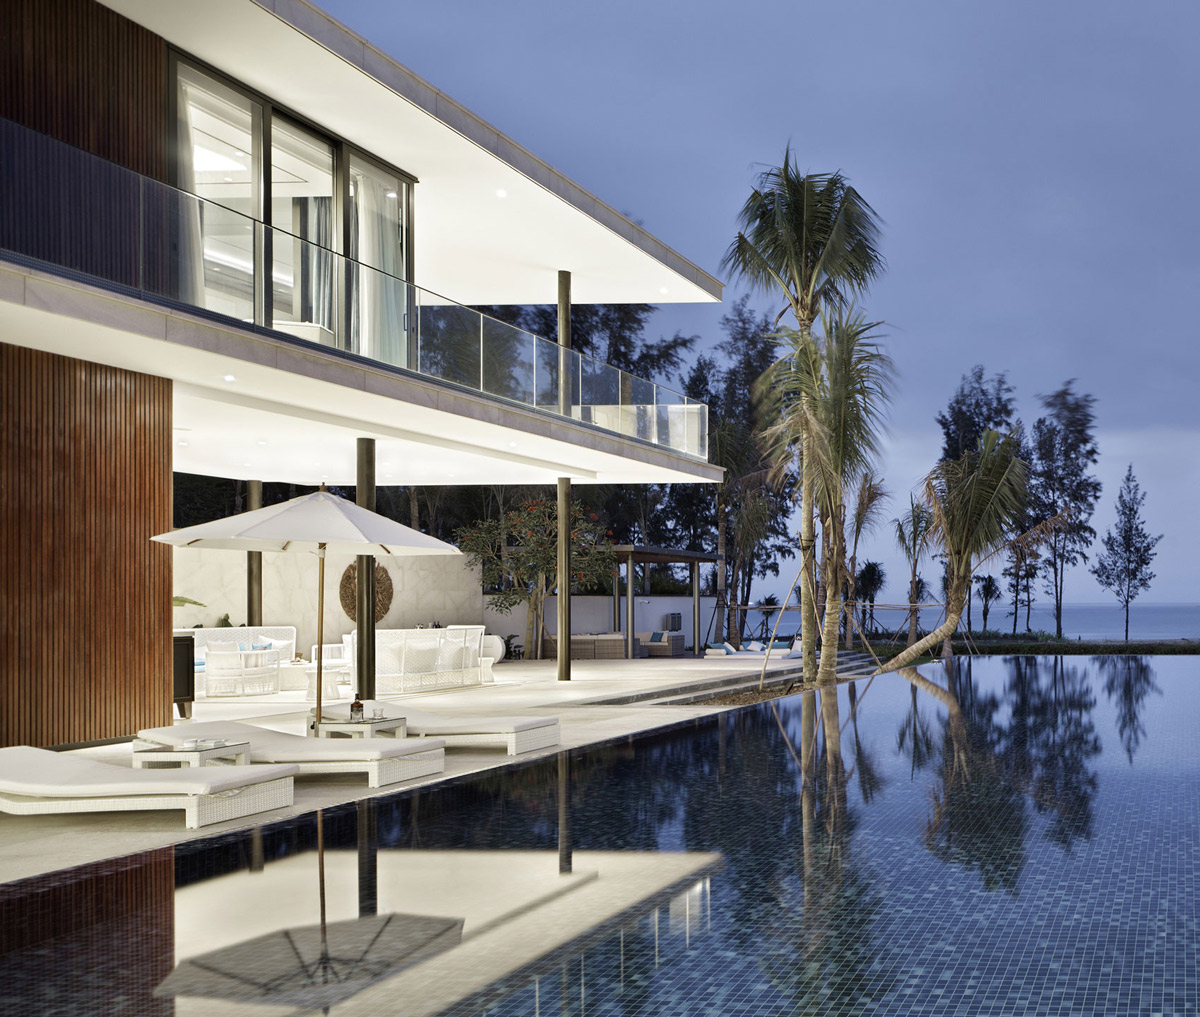 Pool, Sea Views, Beachside Villas in Lingshui, Hainan, China